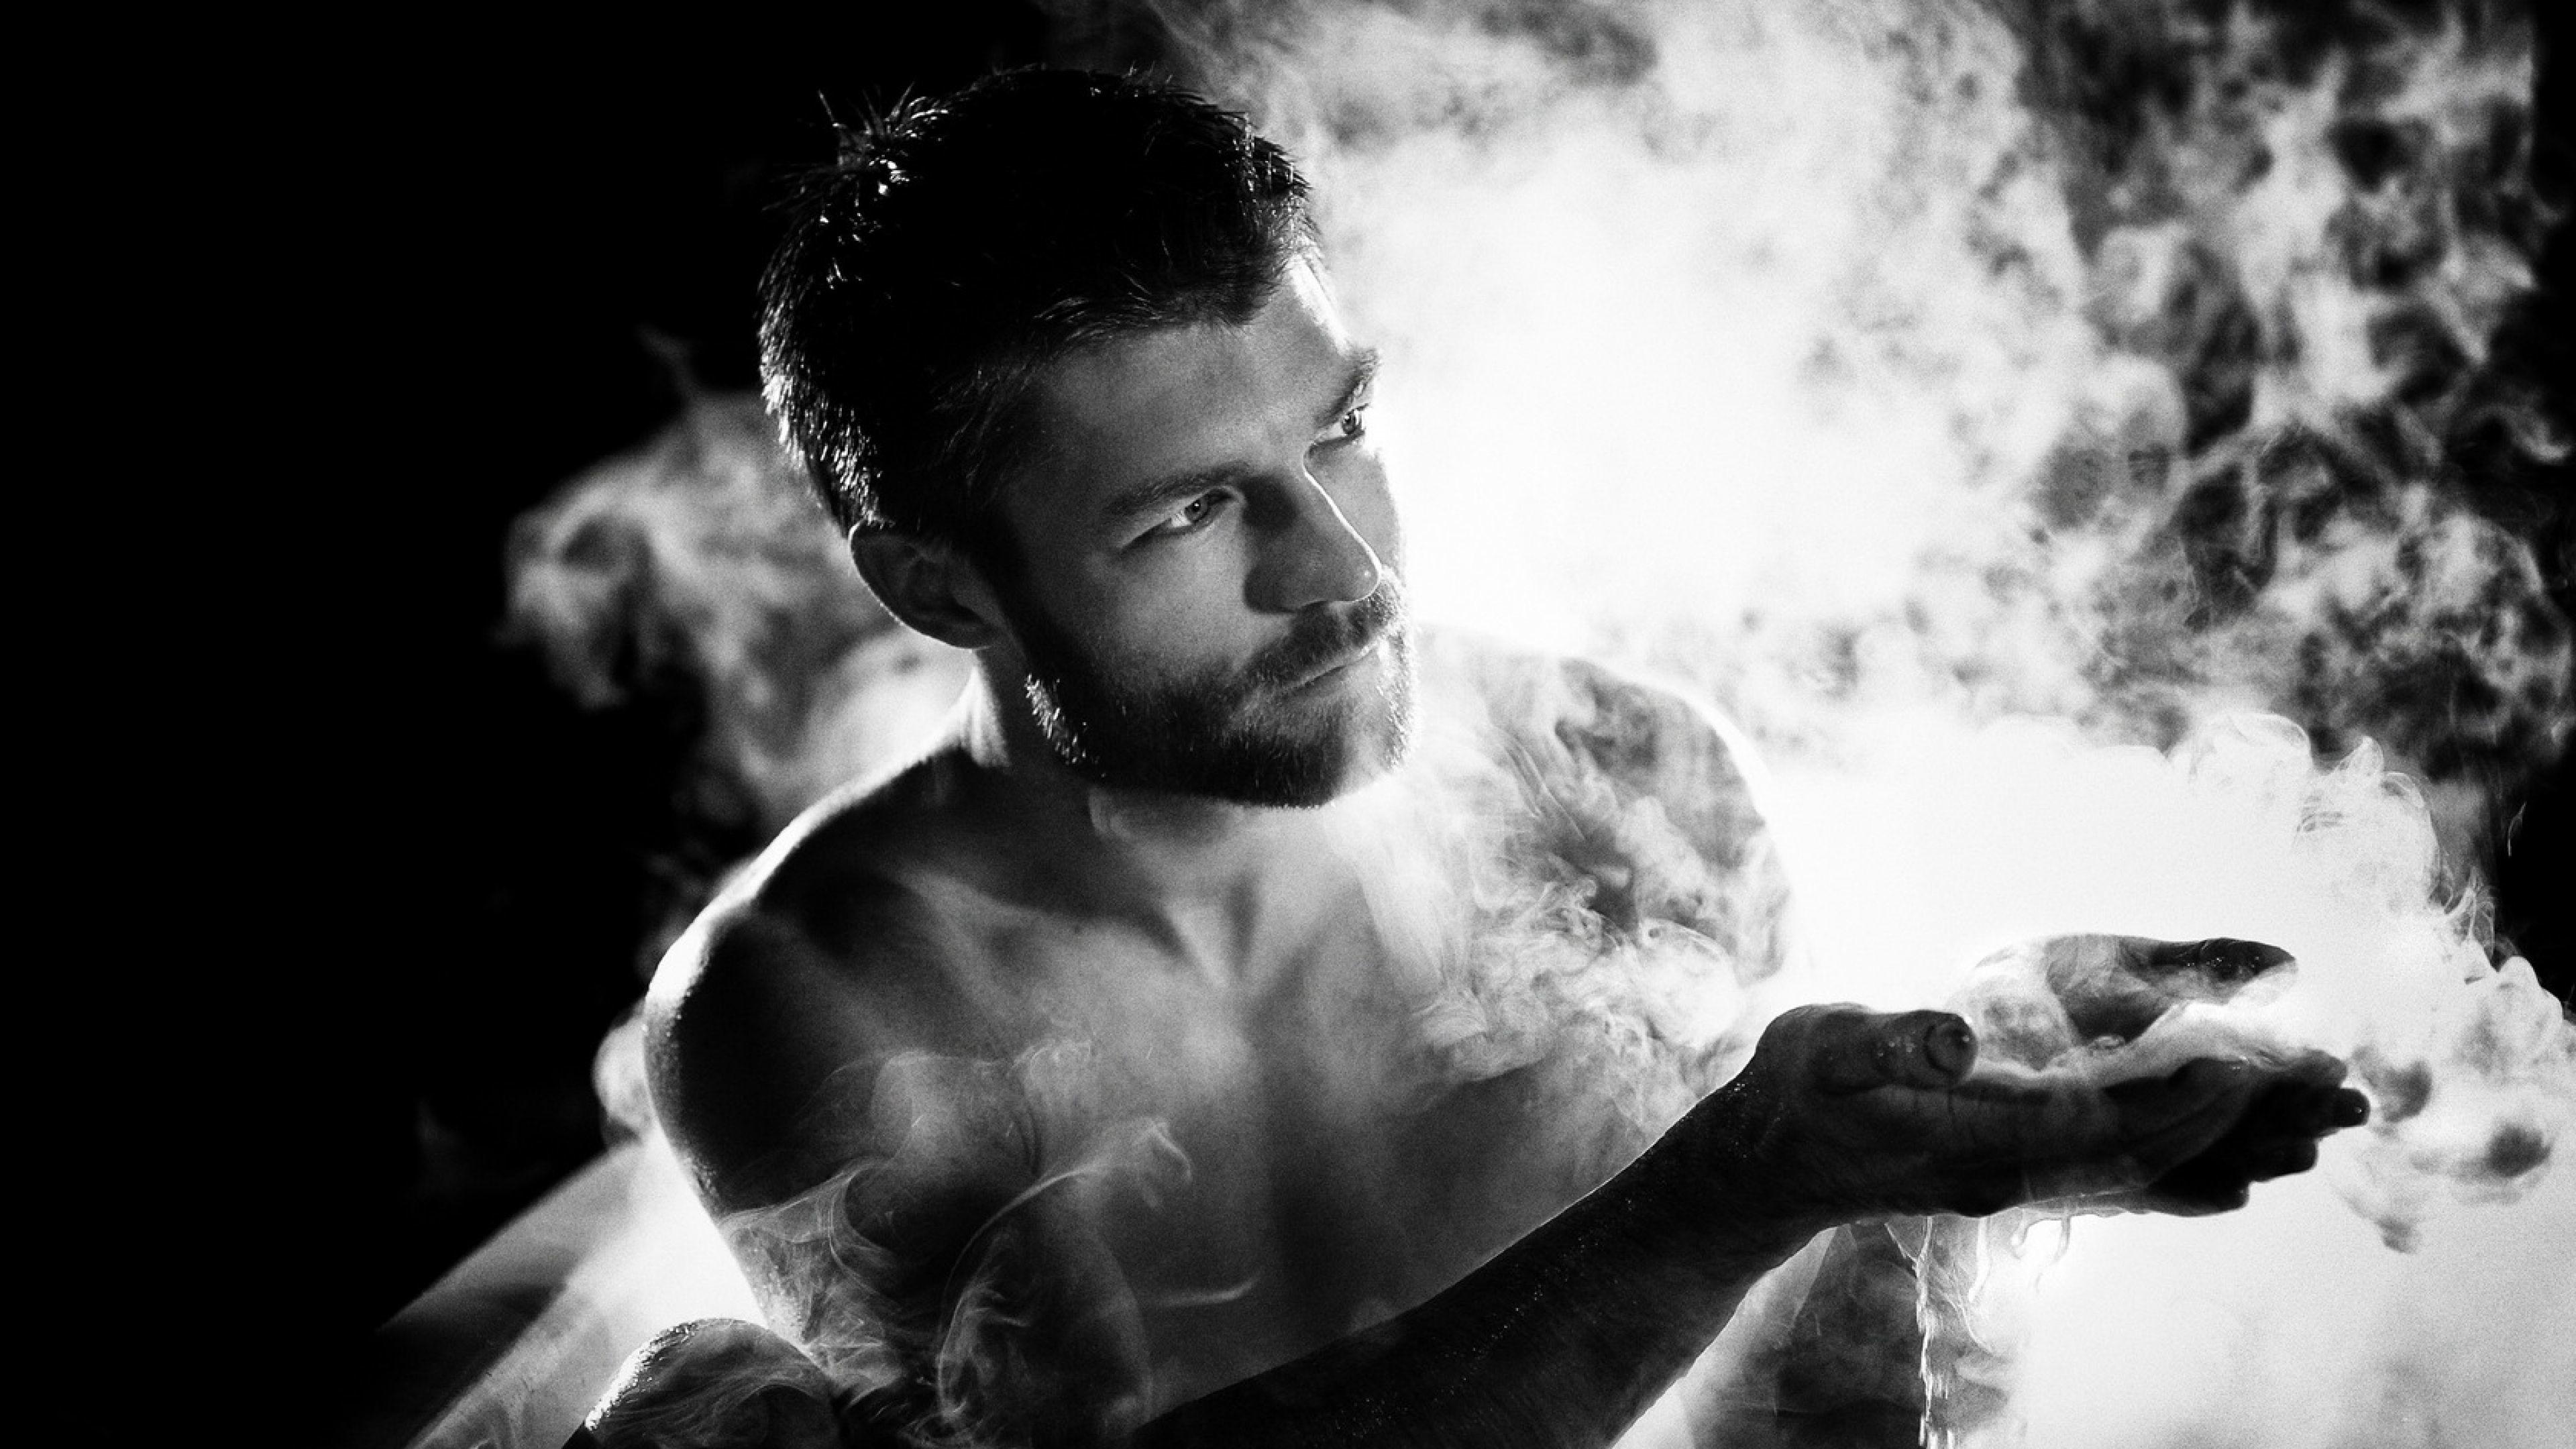 Download Wallpaper Man, Smoke, Black, Black and white 4K .